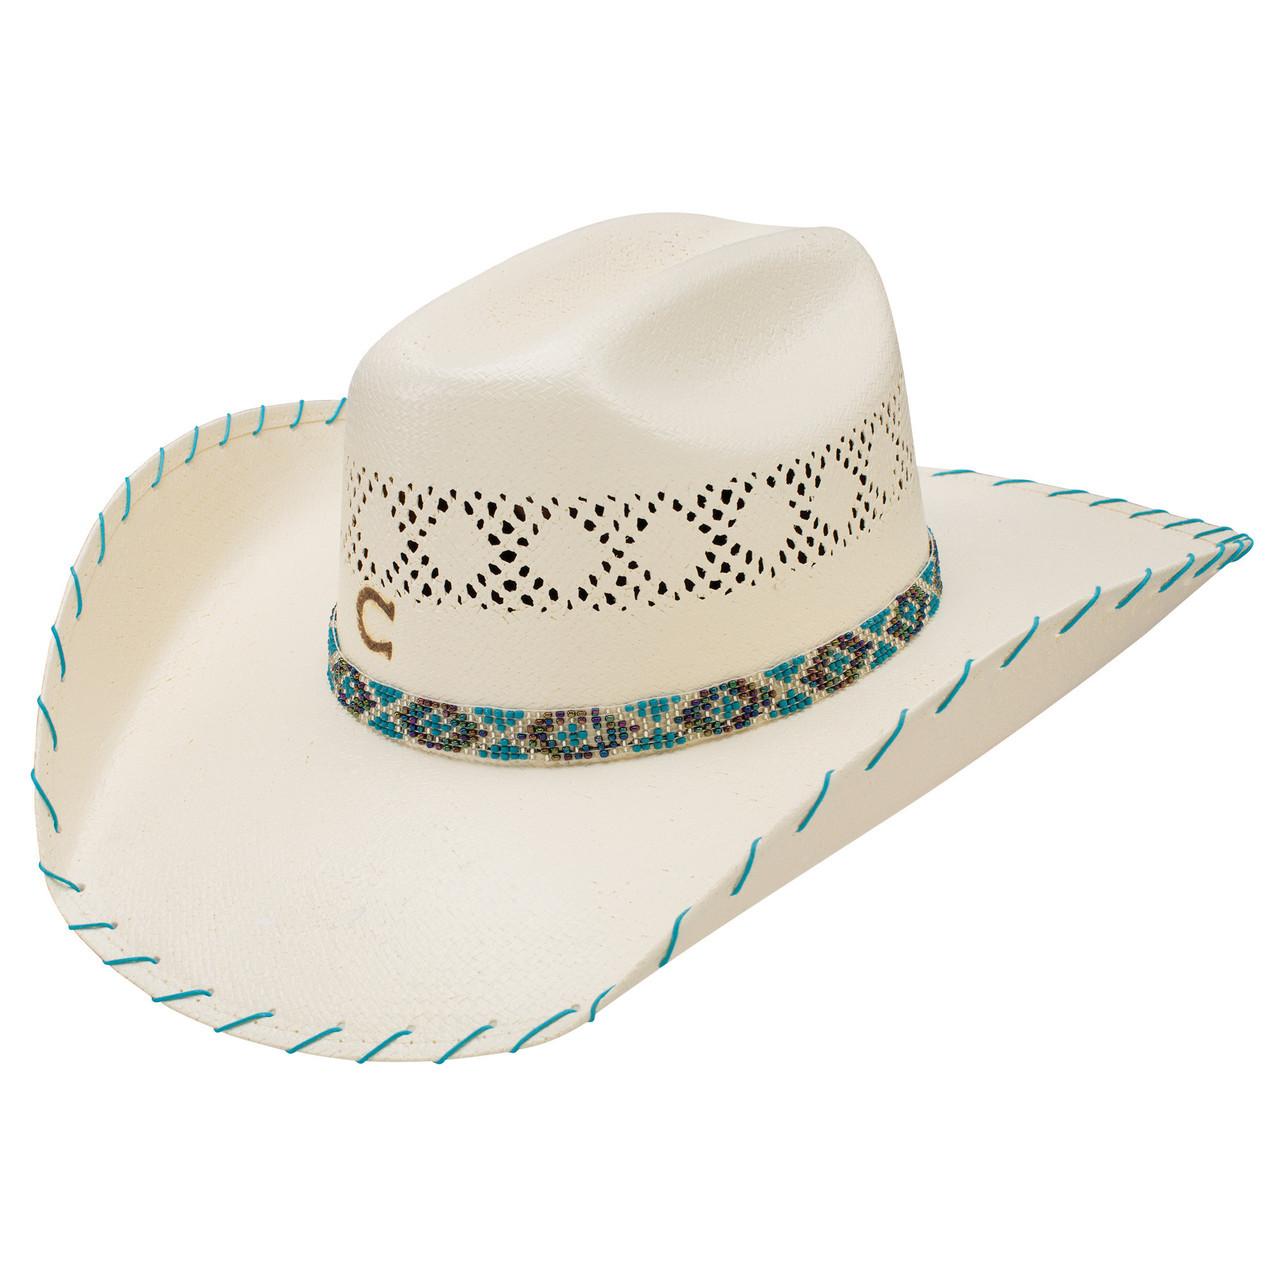 Charlie 1 Horse - Kids - Apache Jr - Billy s Western Wear 39a5be6070d4